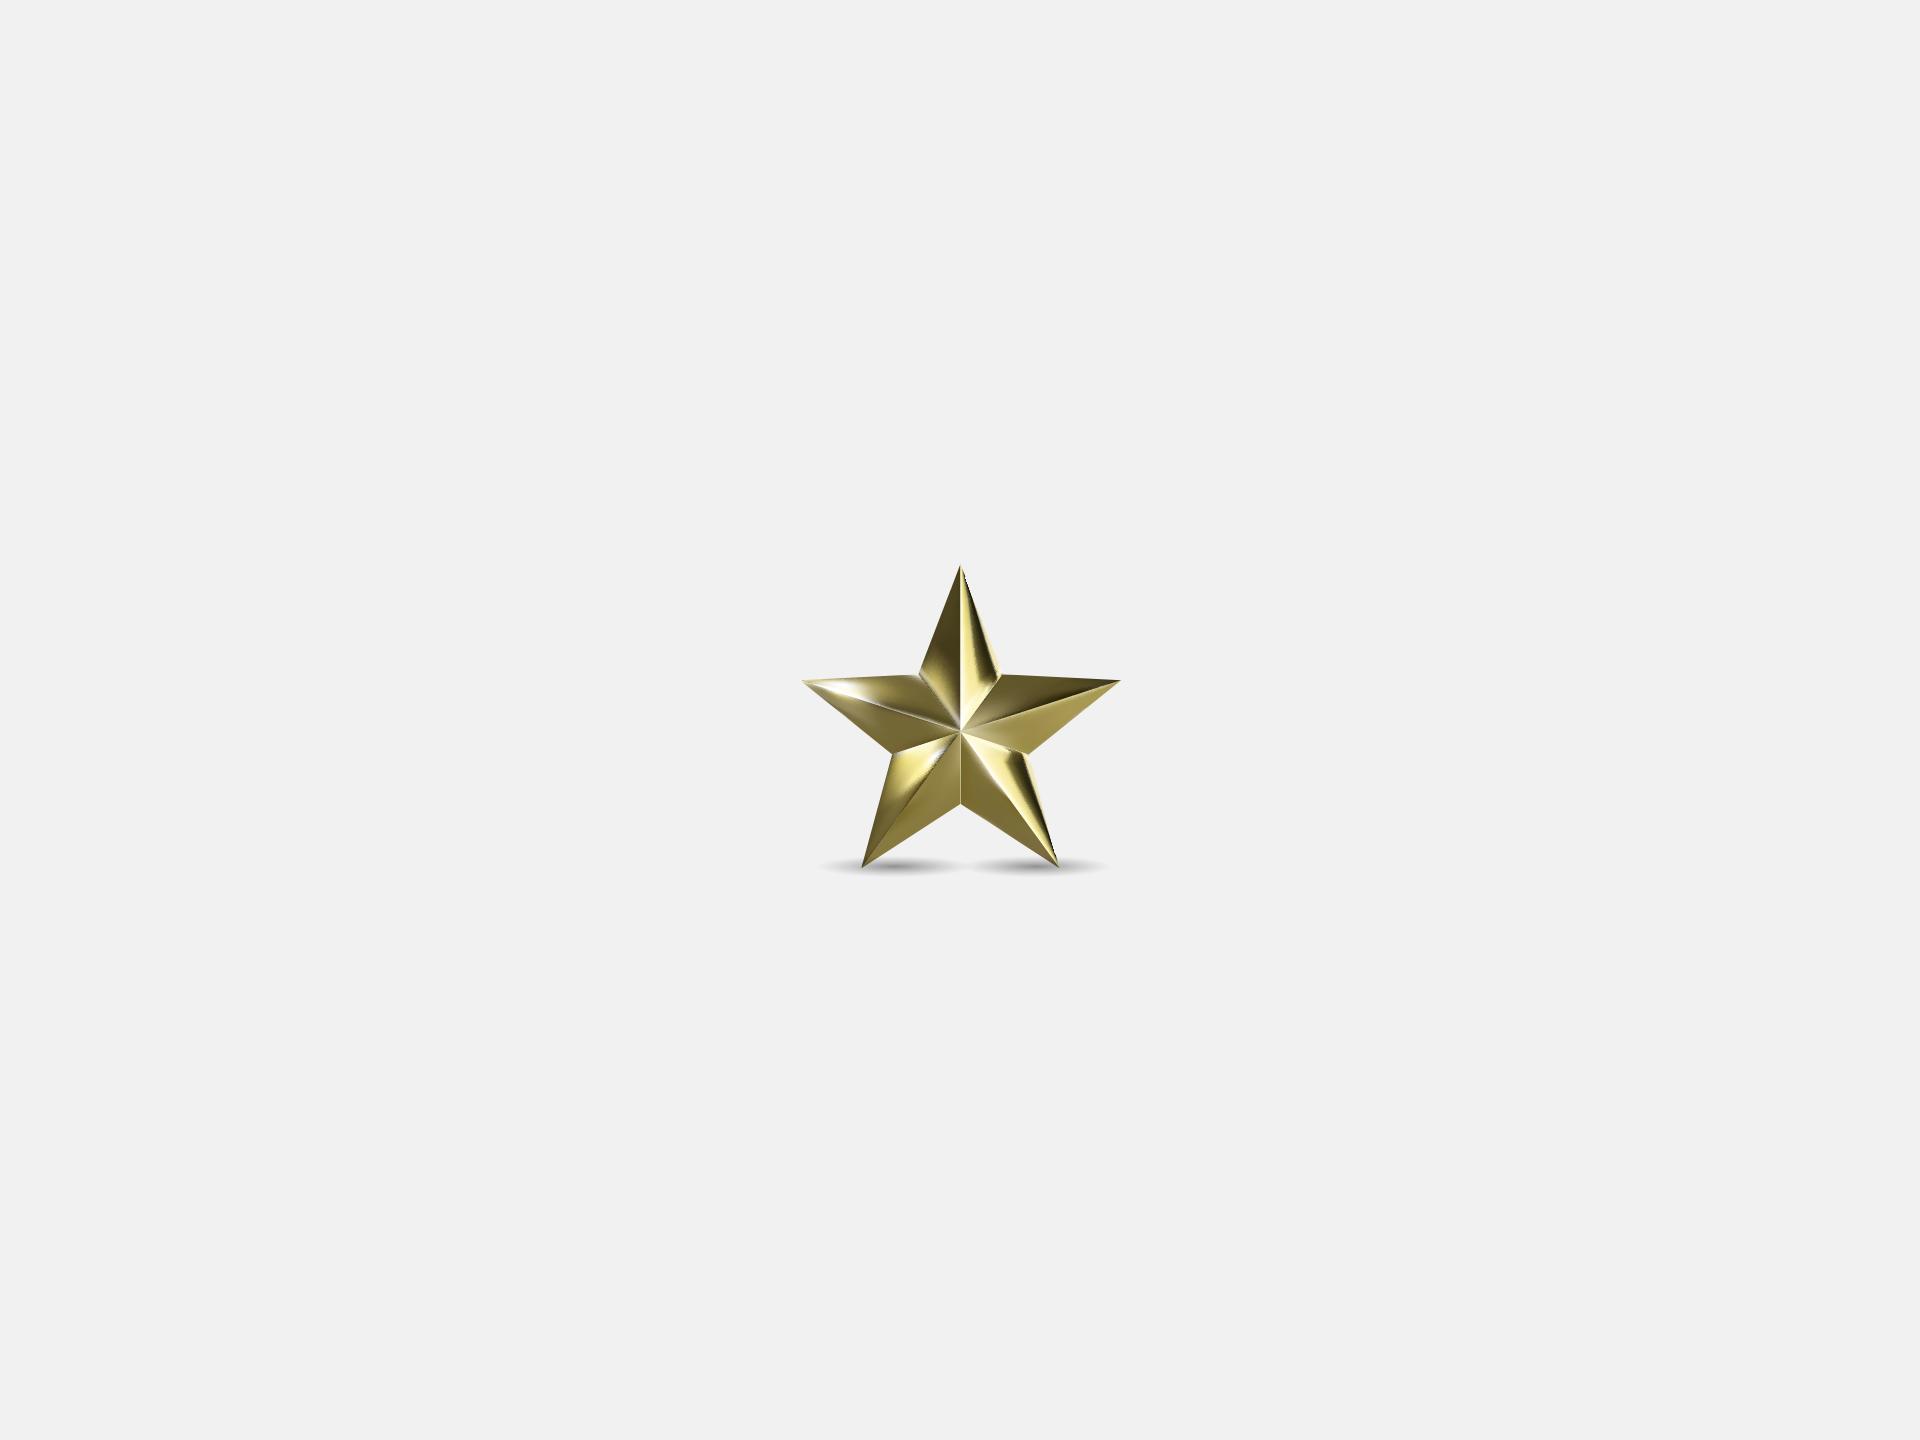 UURA_STAR_WB_A2016